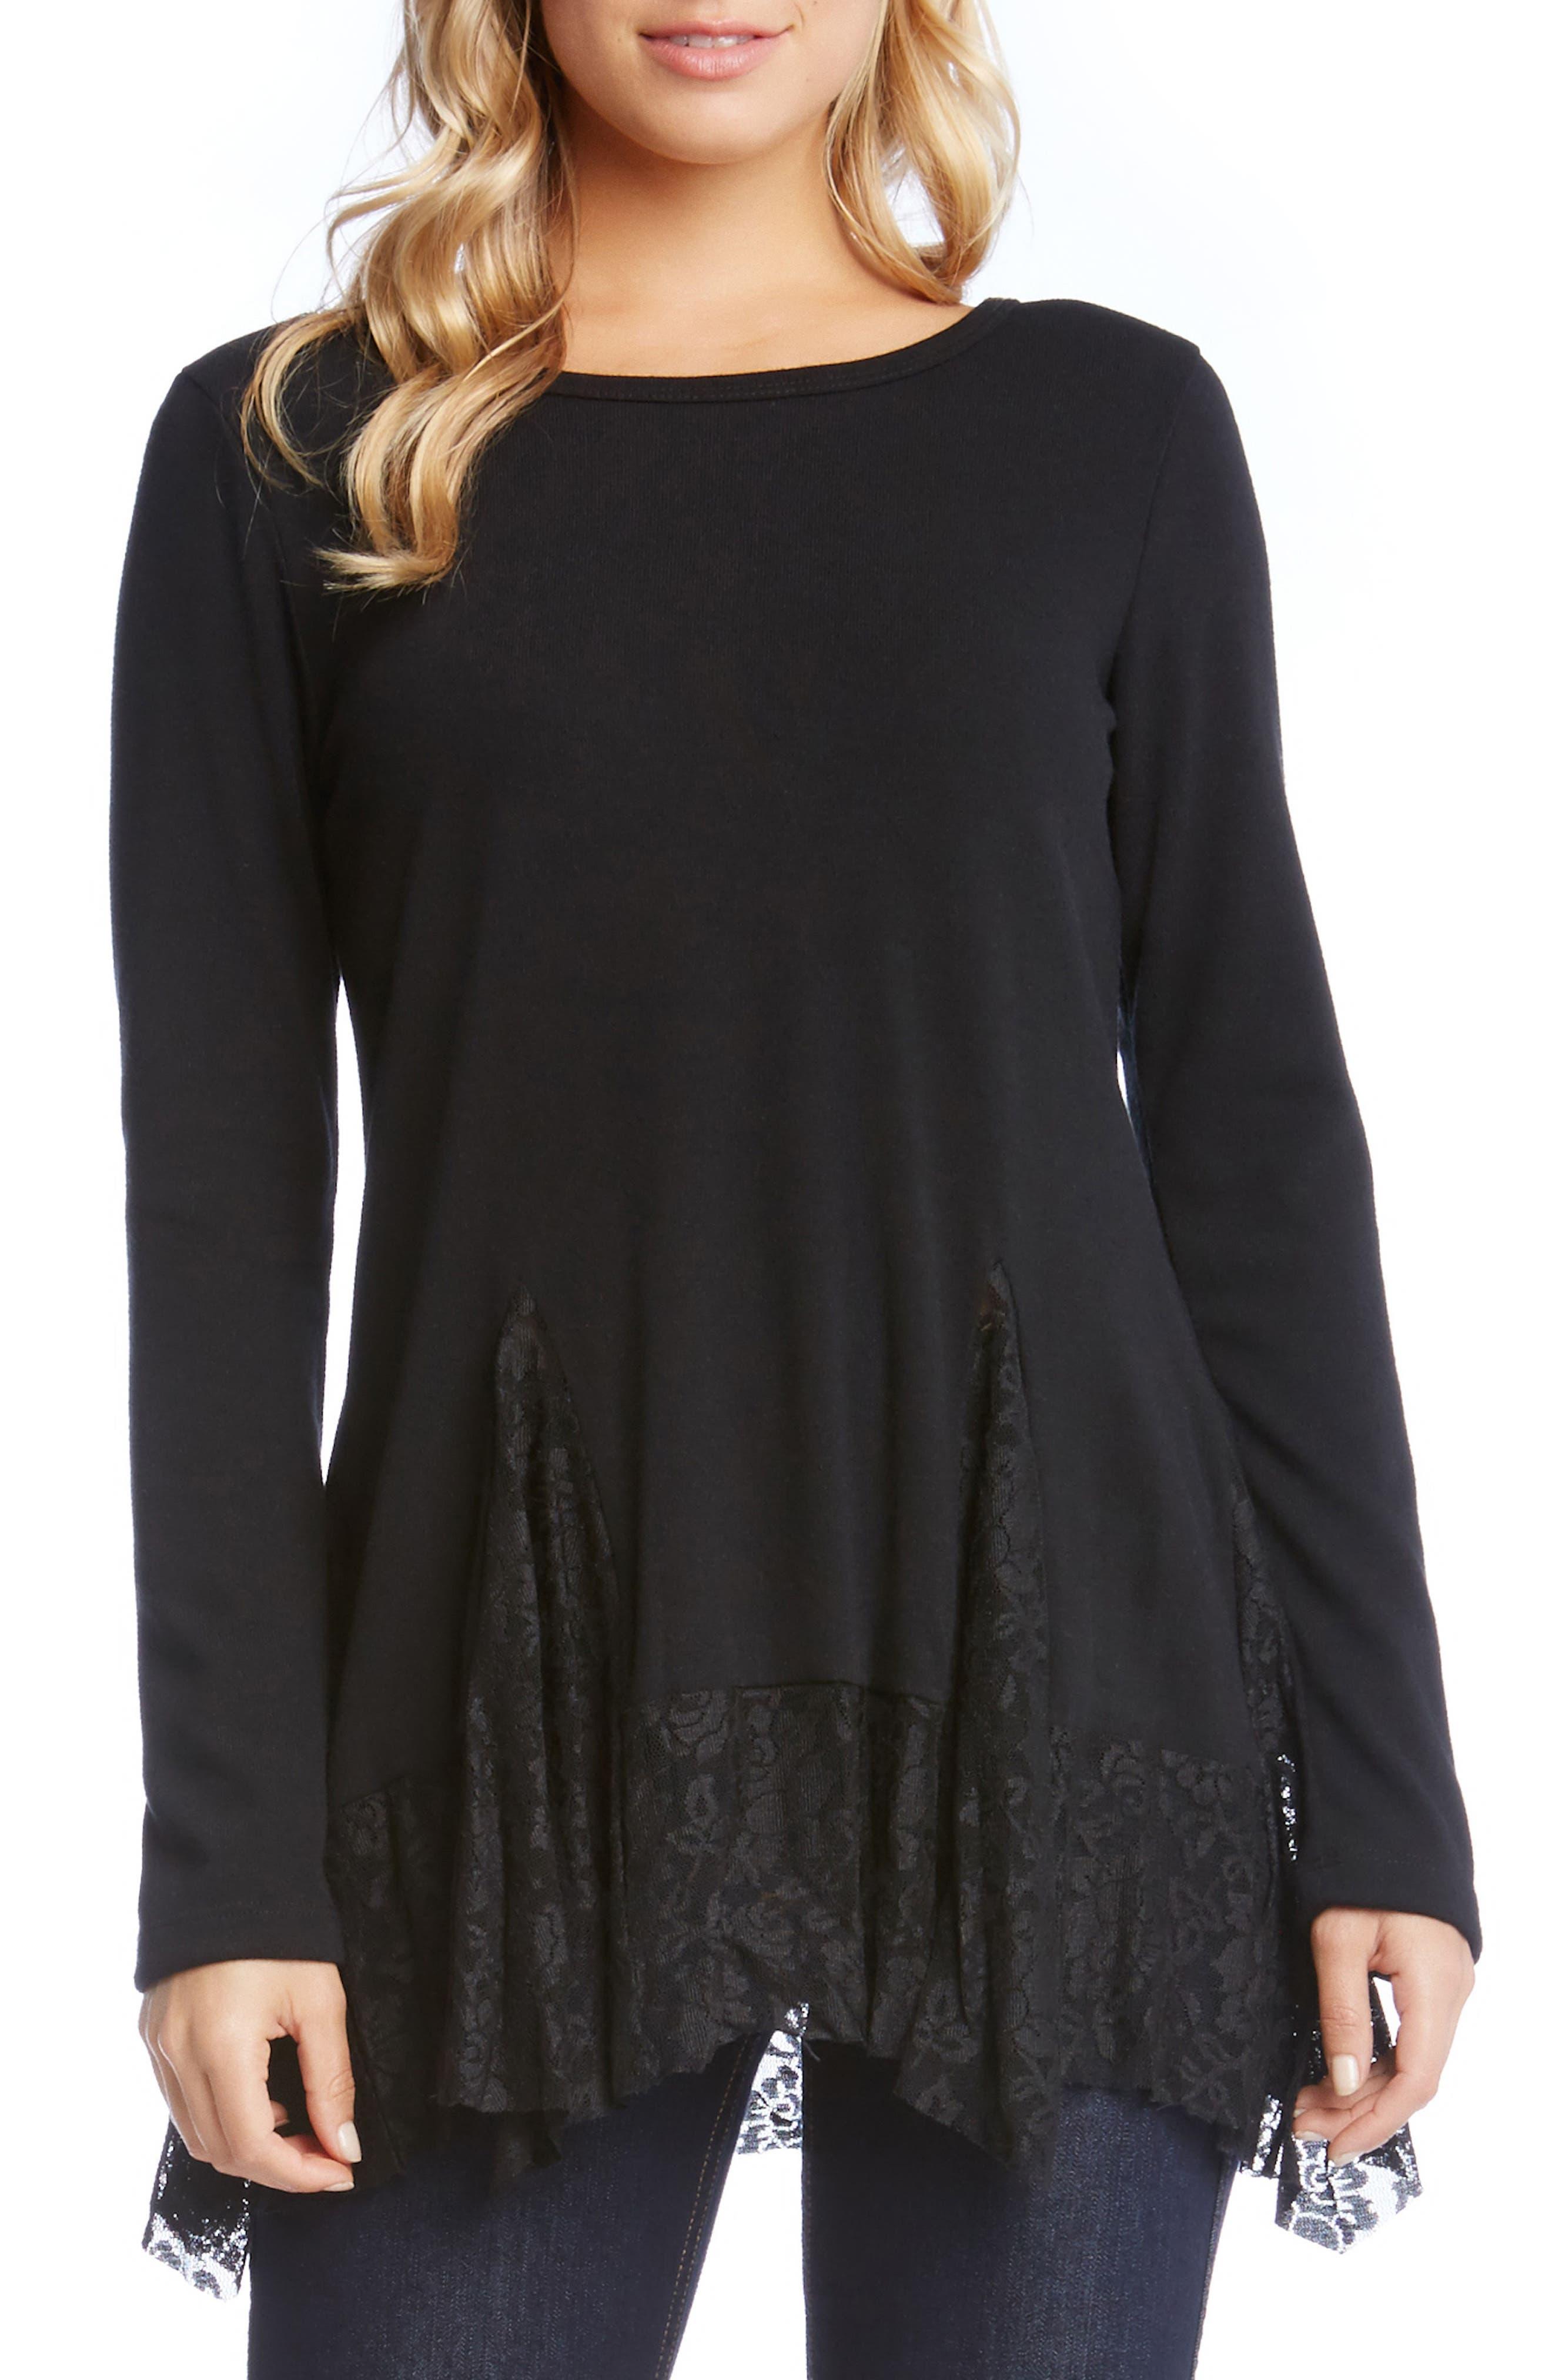 Karen Karen Lace Inset Sweater,                         Main,                         color, Black